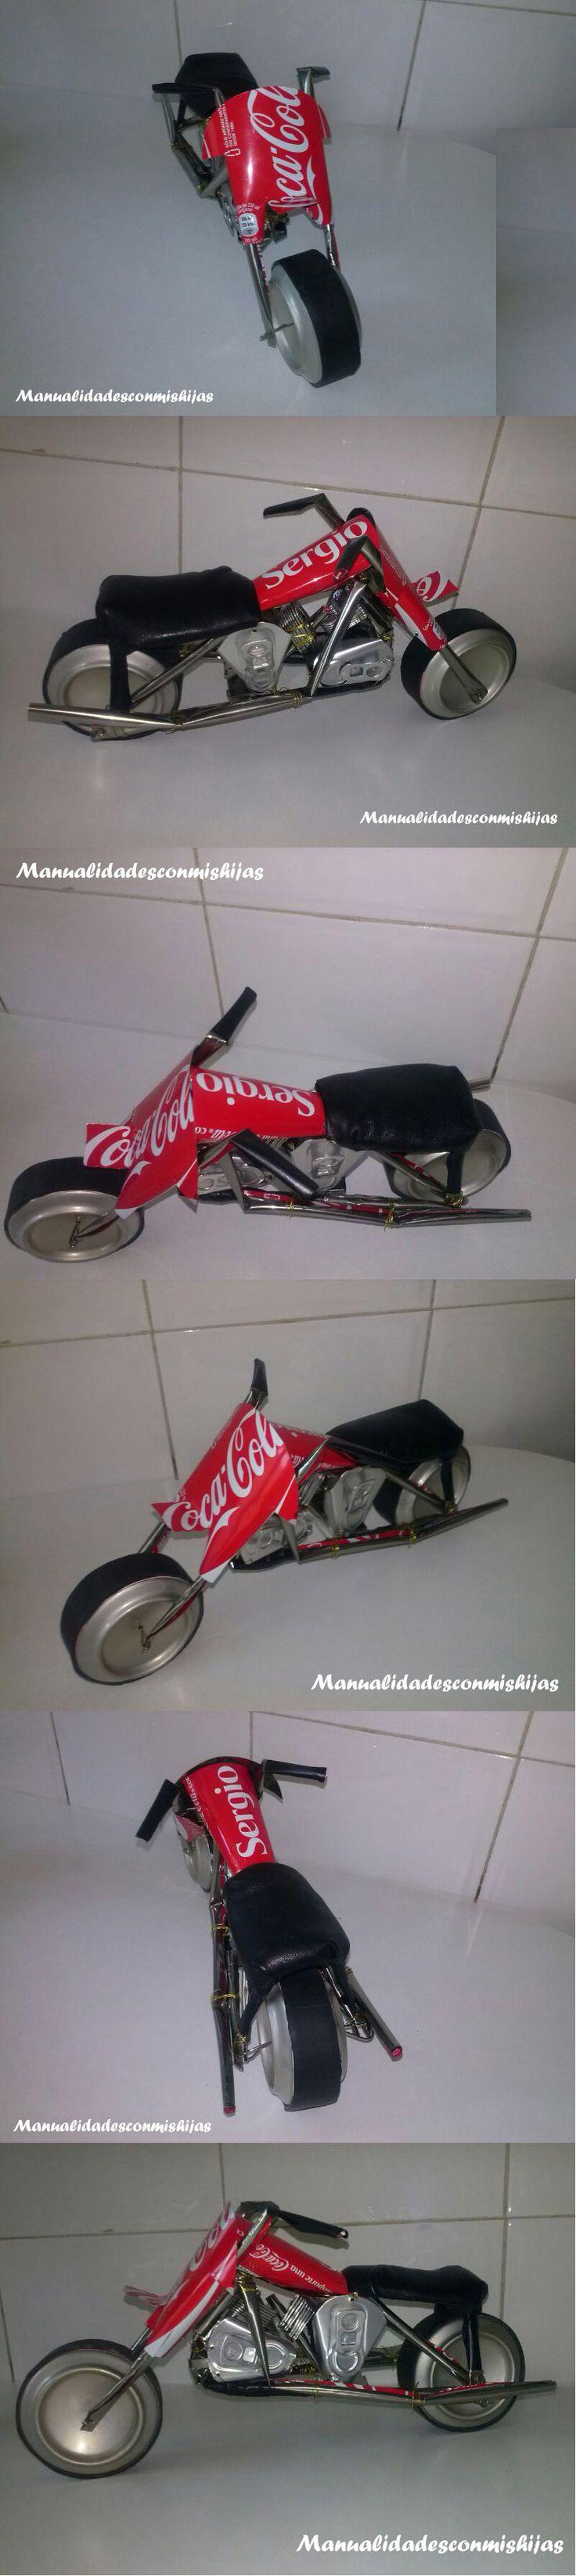 Moto realizada con latas de coca cola - Coke-can made motorbike